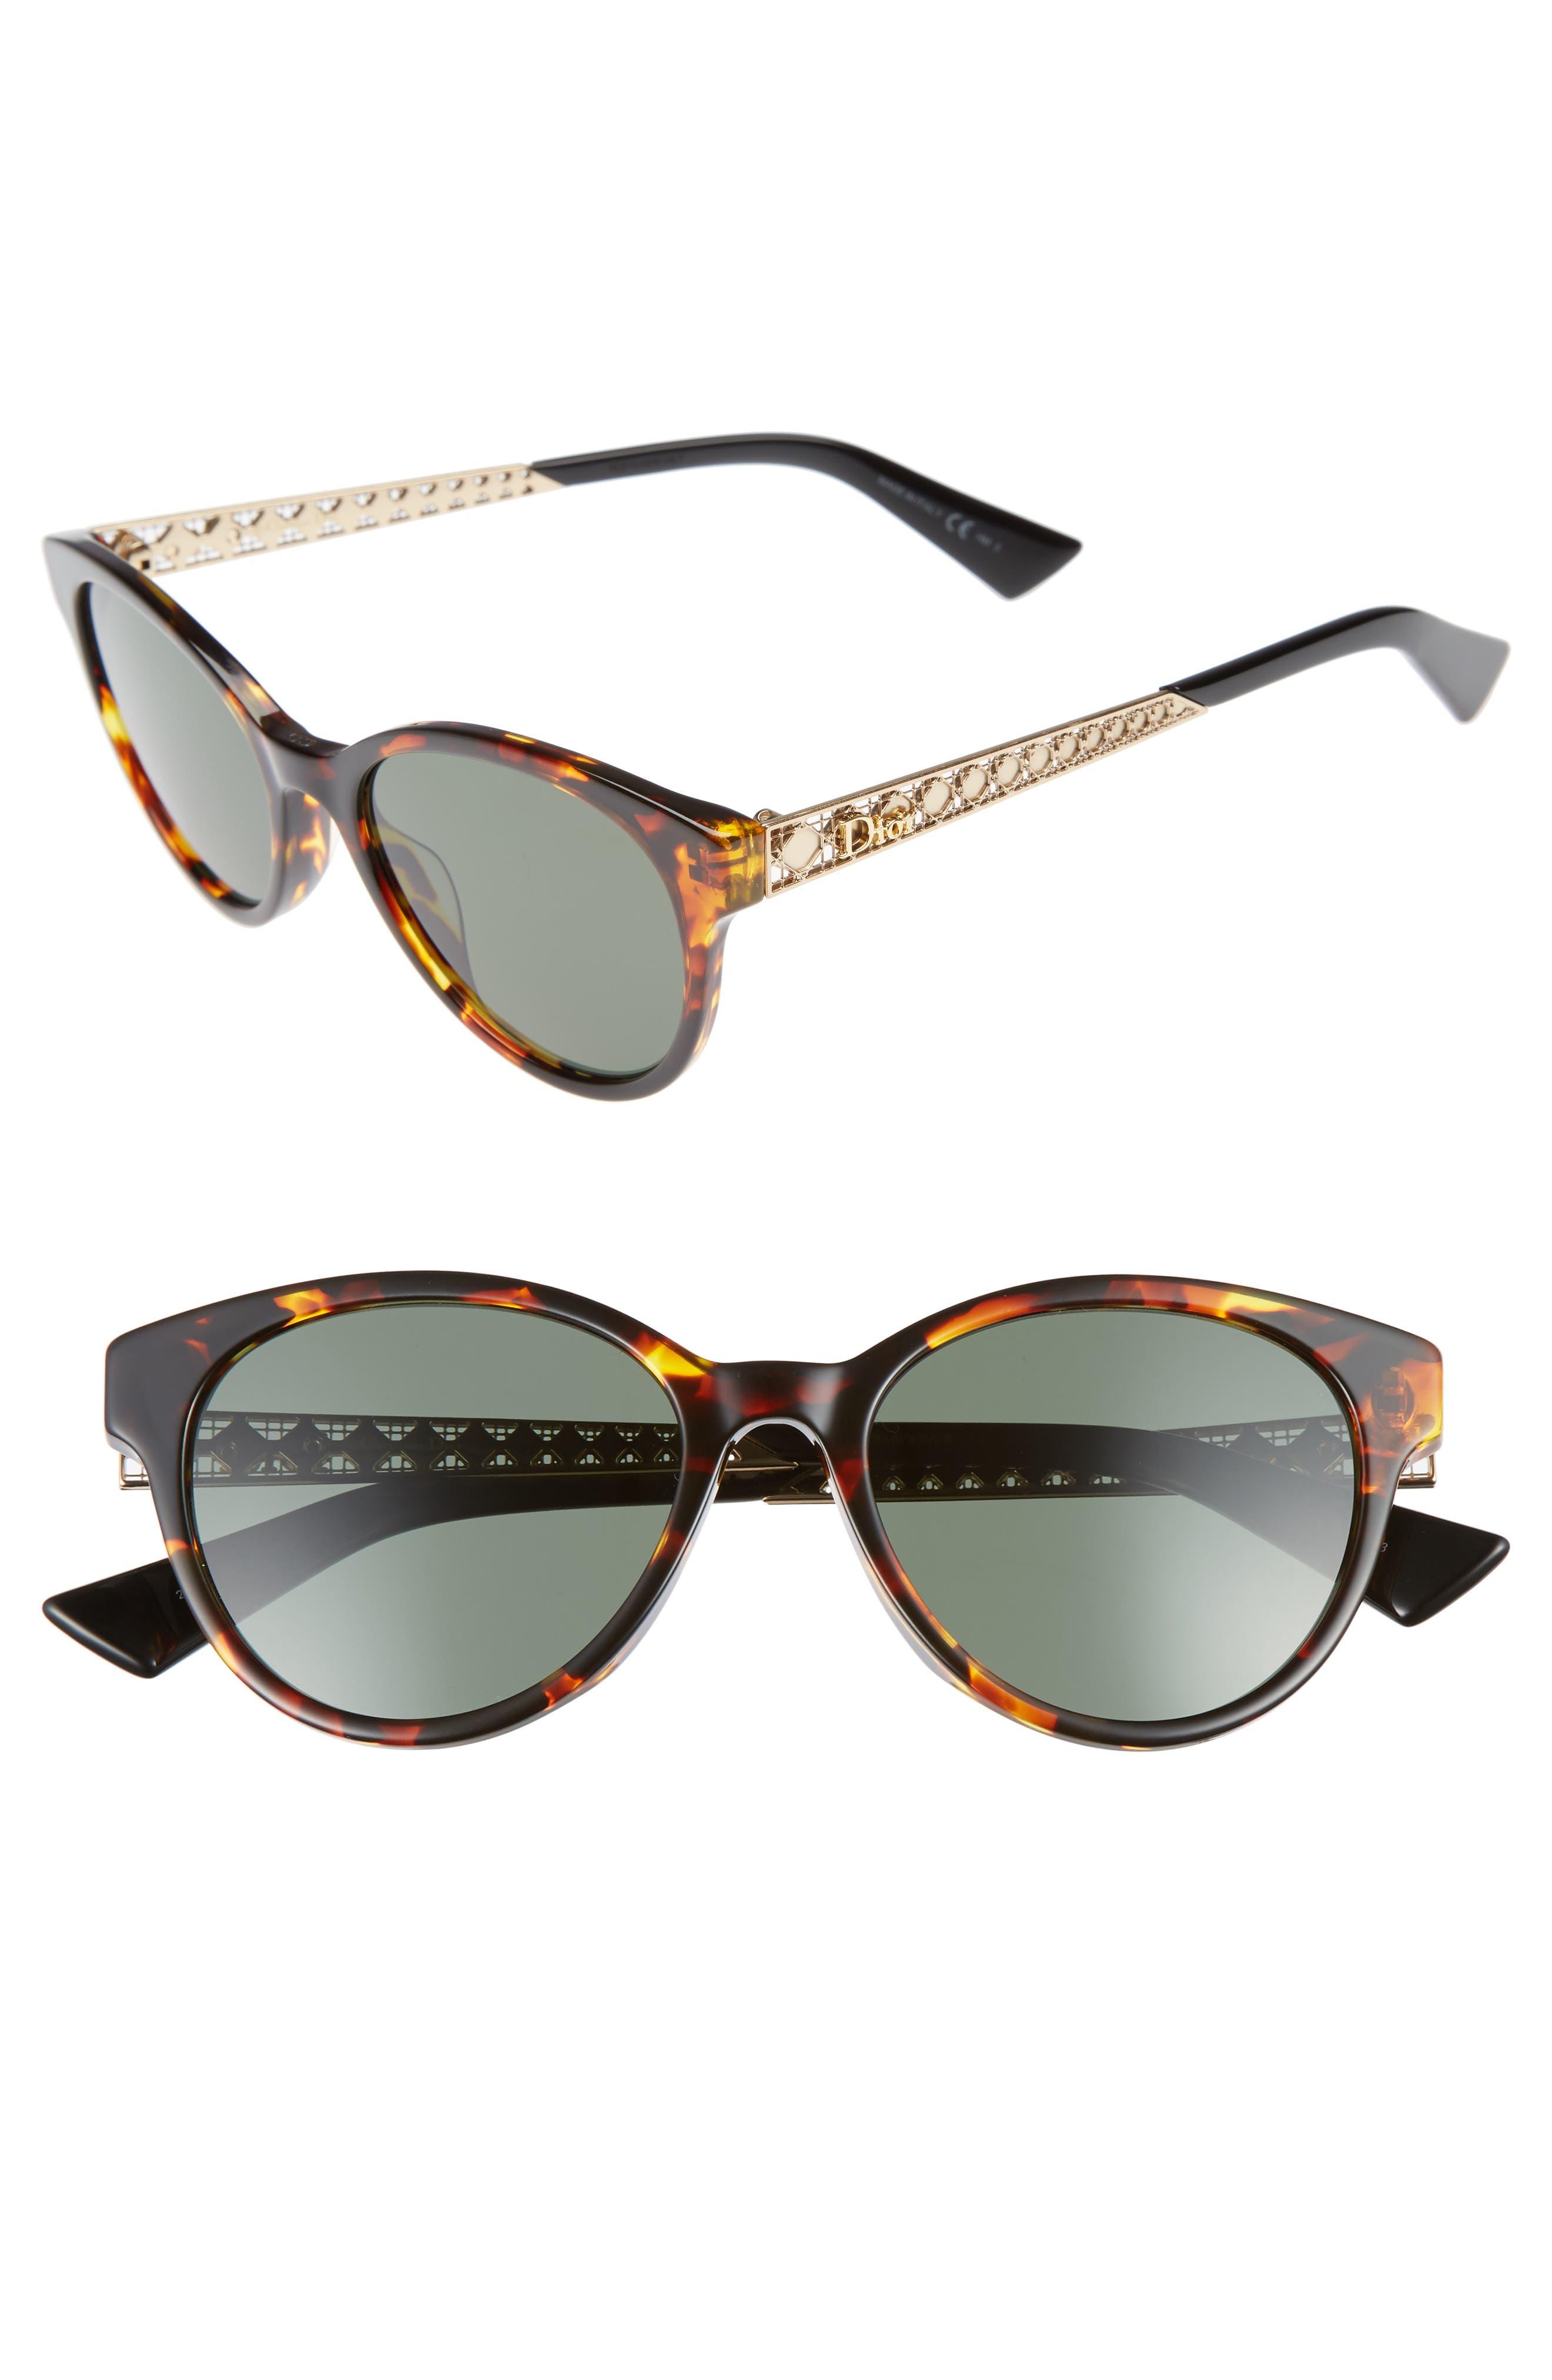 Dior Diorama Mini 52mm Mirrored Lens Special Fit Sunglasses